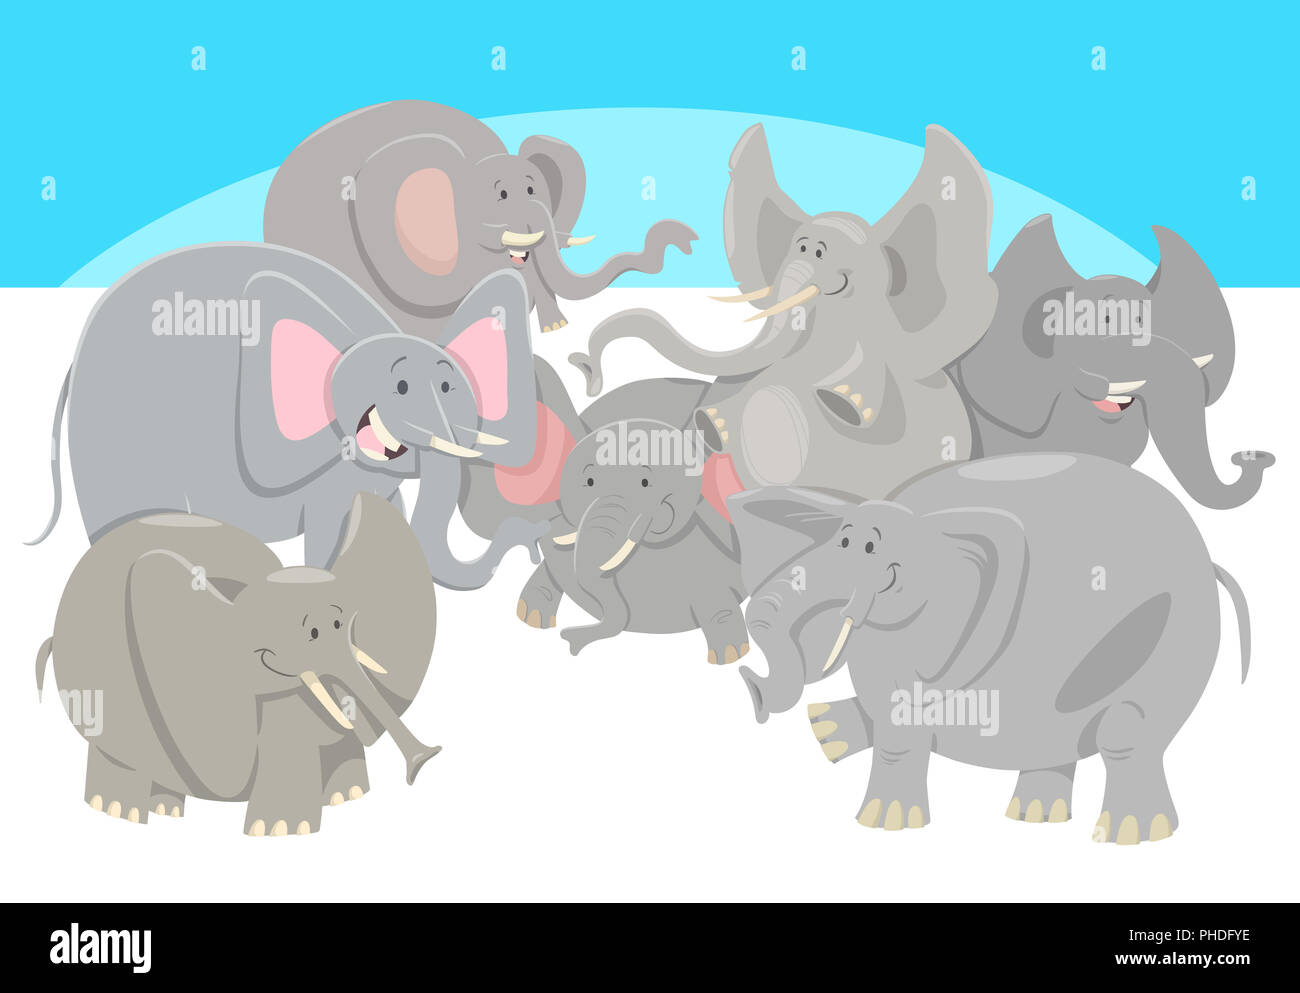 Cartoon Elephants Animal Characters Group Stock Photo Alamy